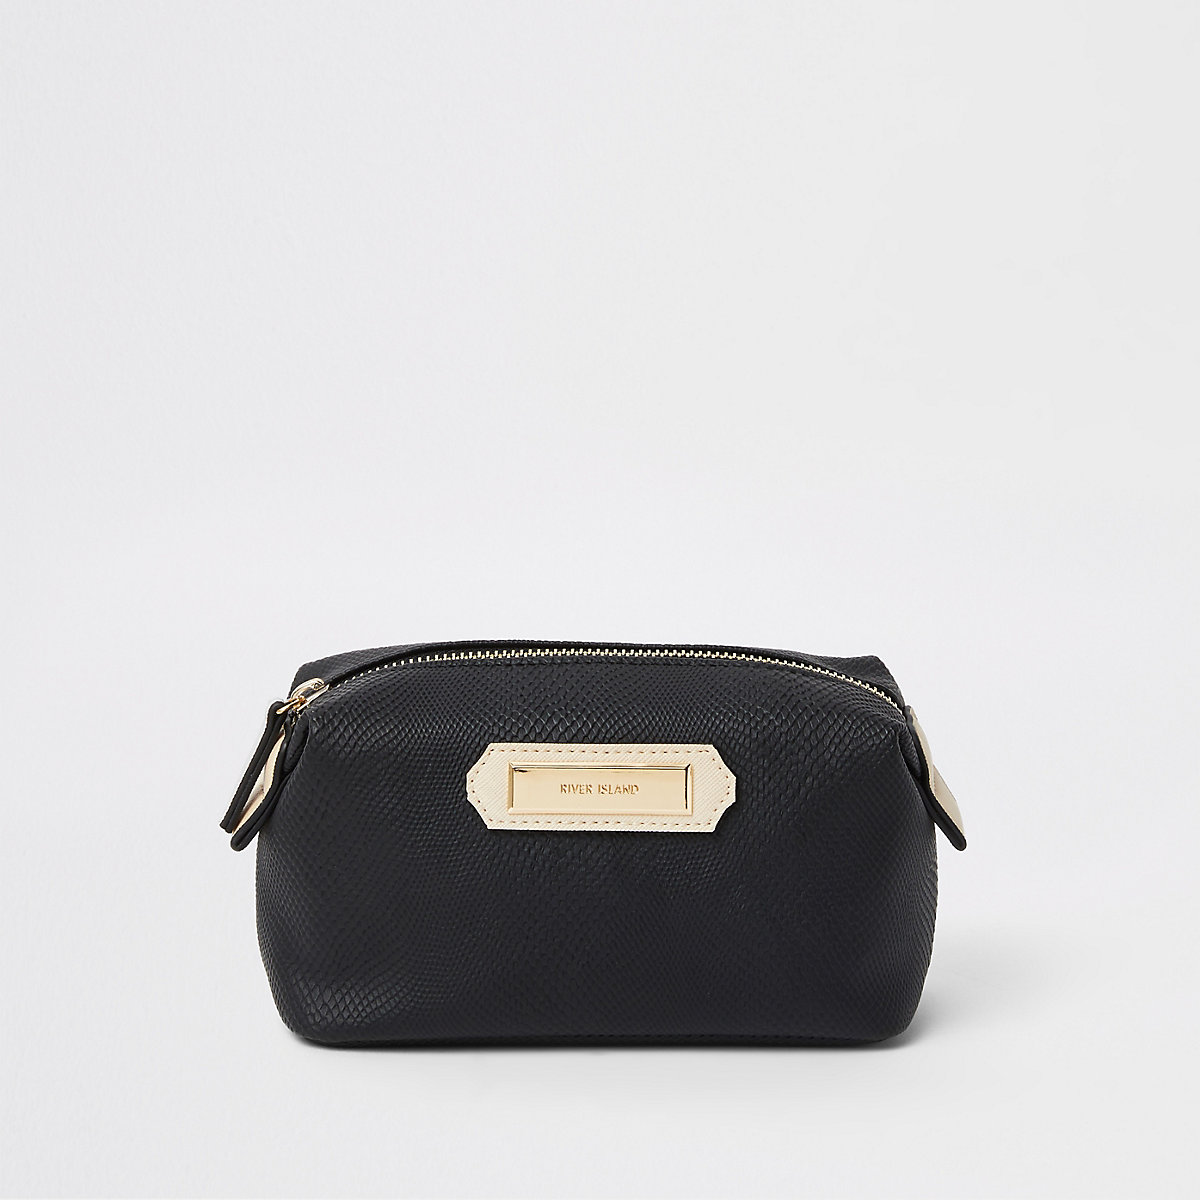 Black zip top makeup bag